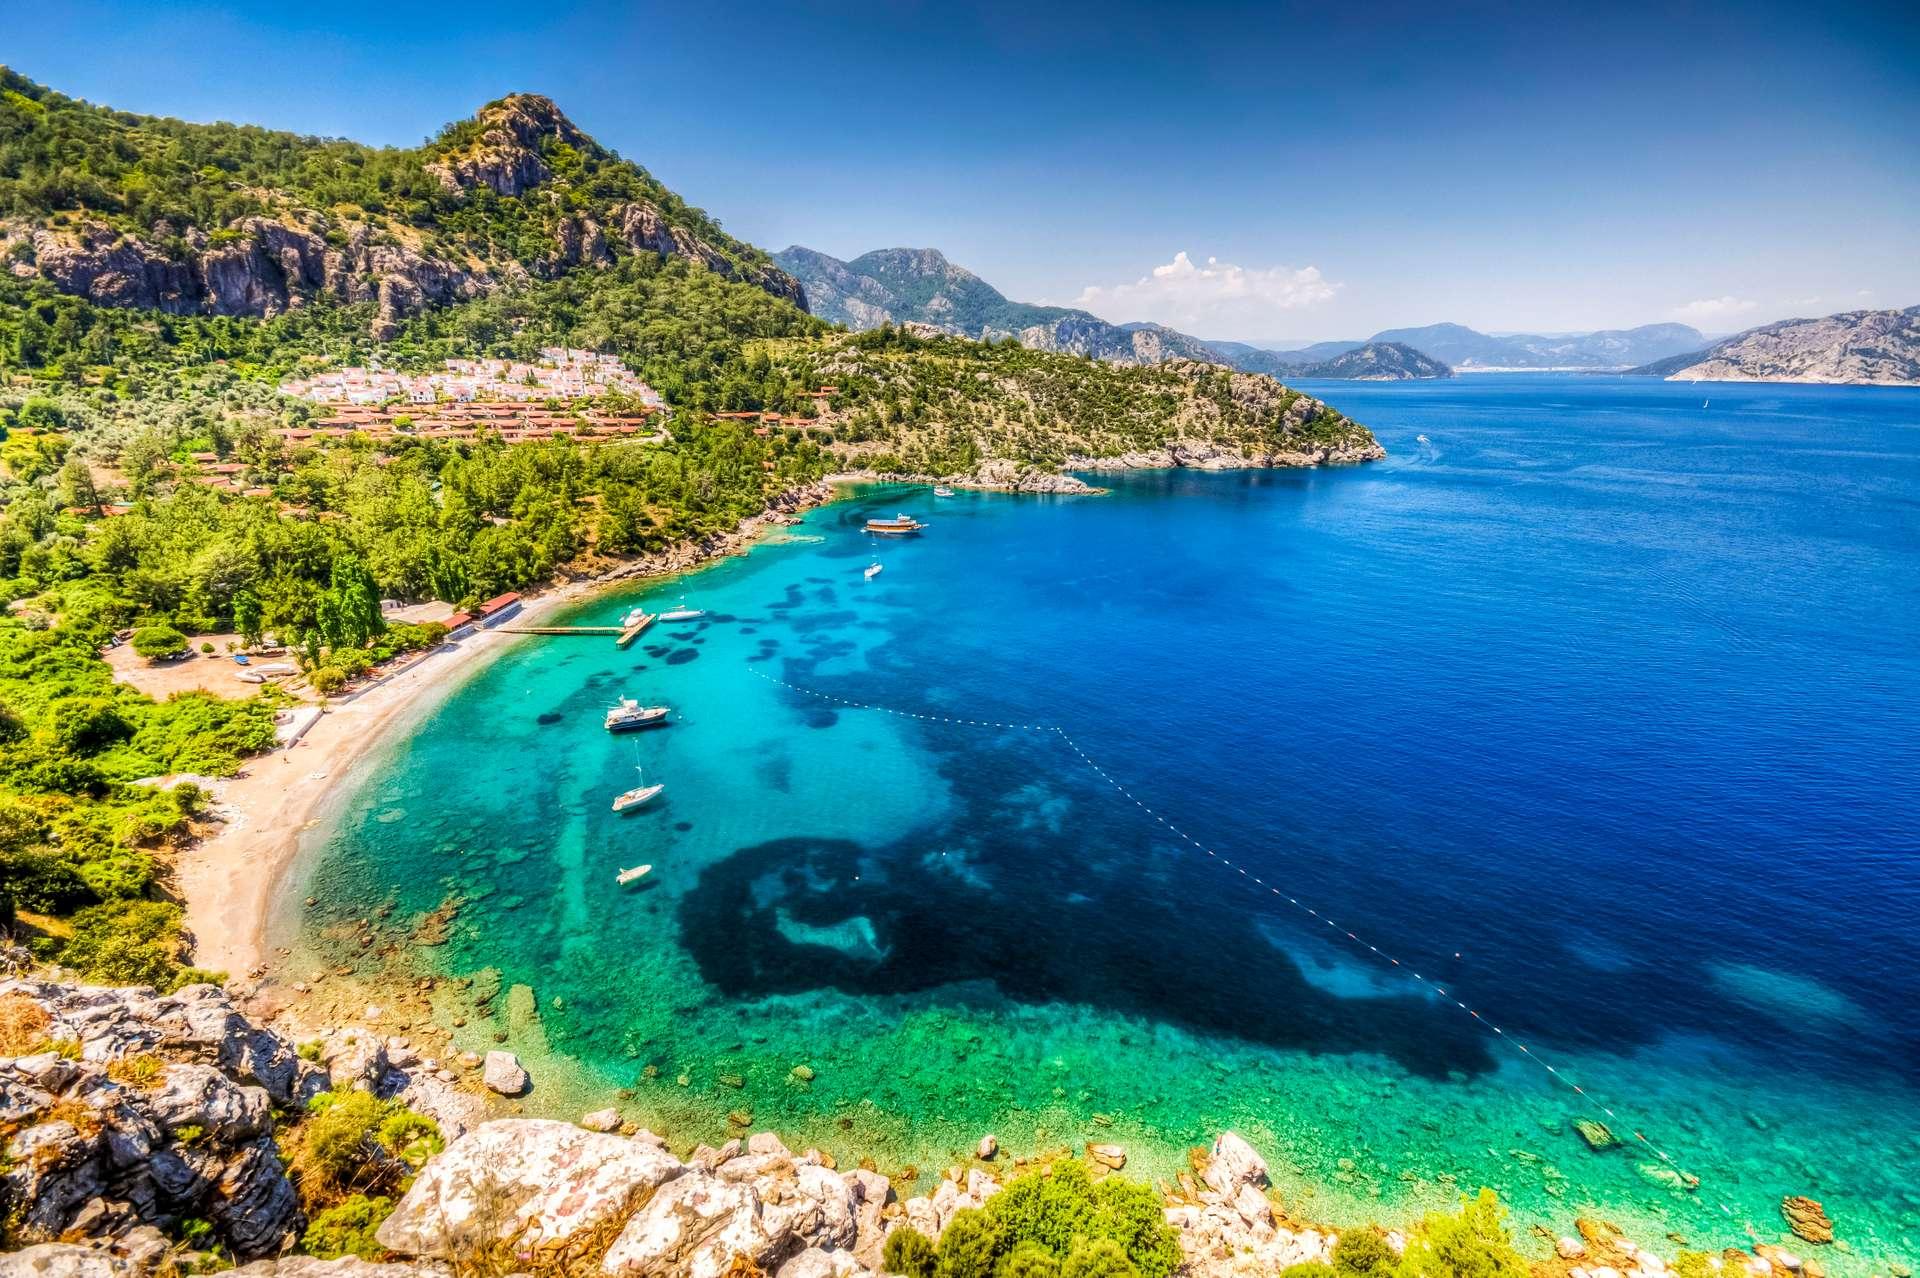 Turkije Marmaris Turunc Bay